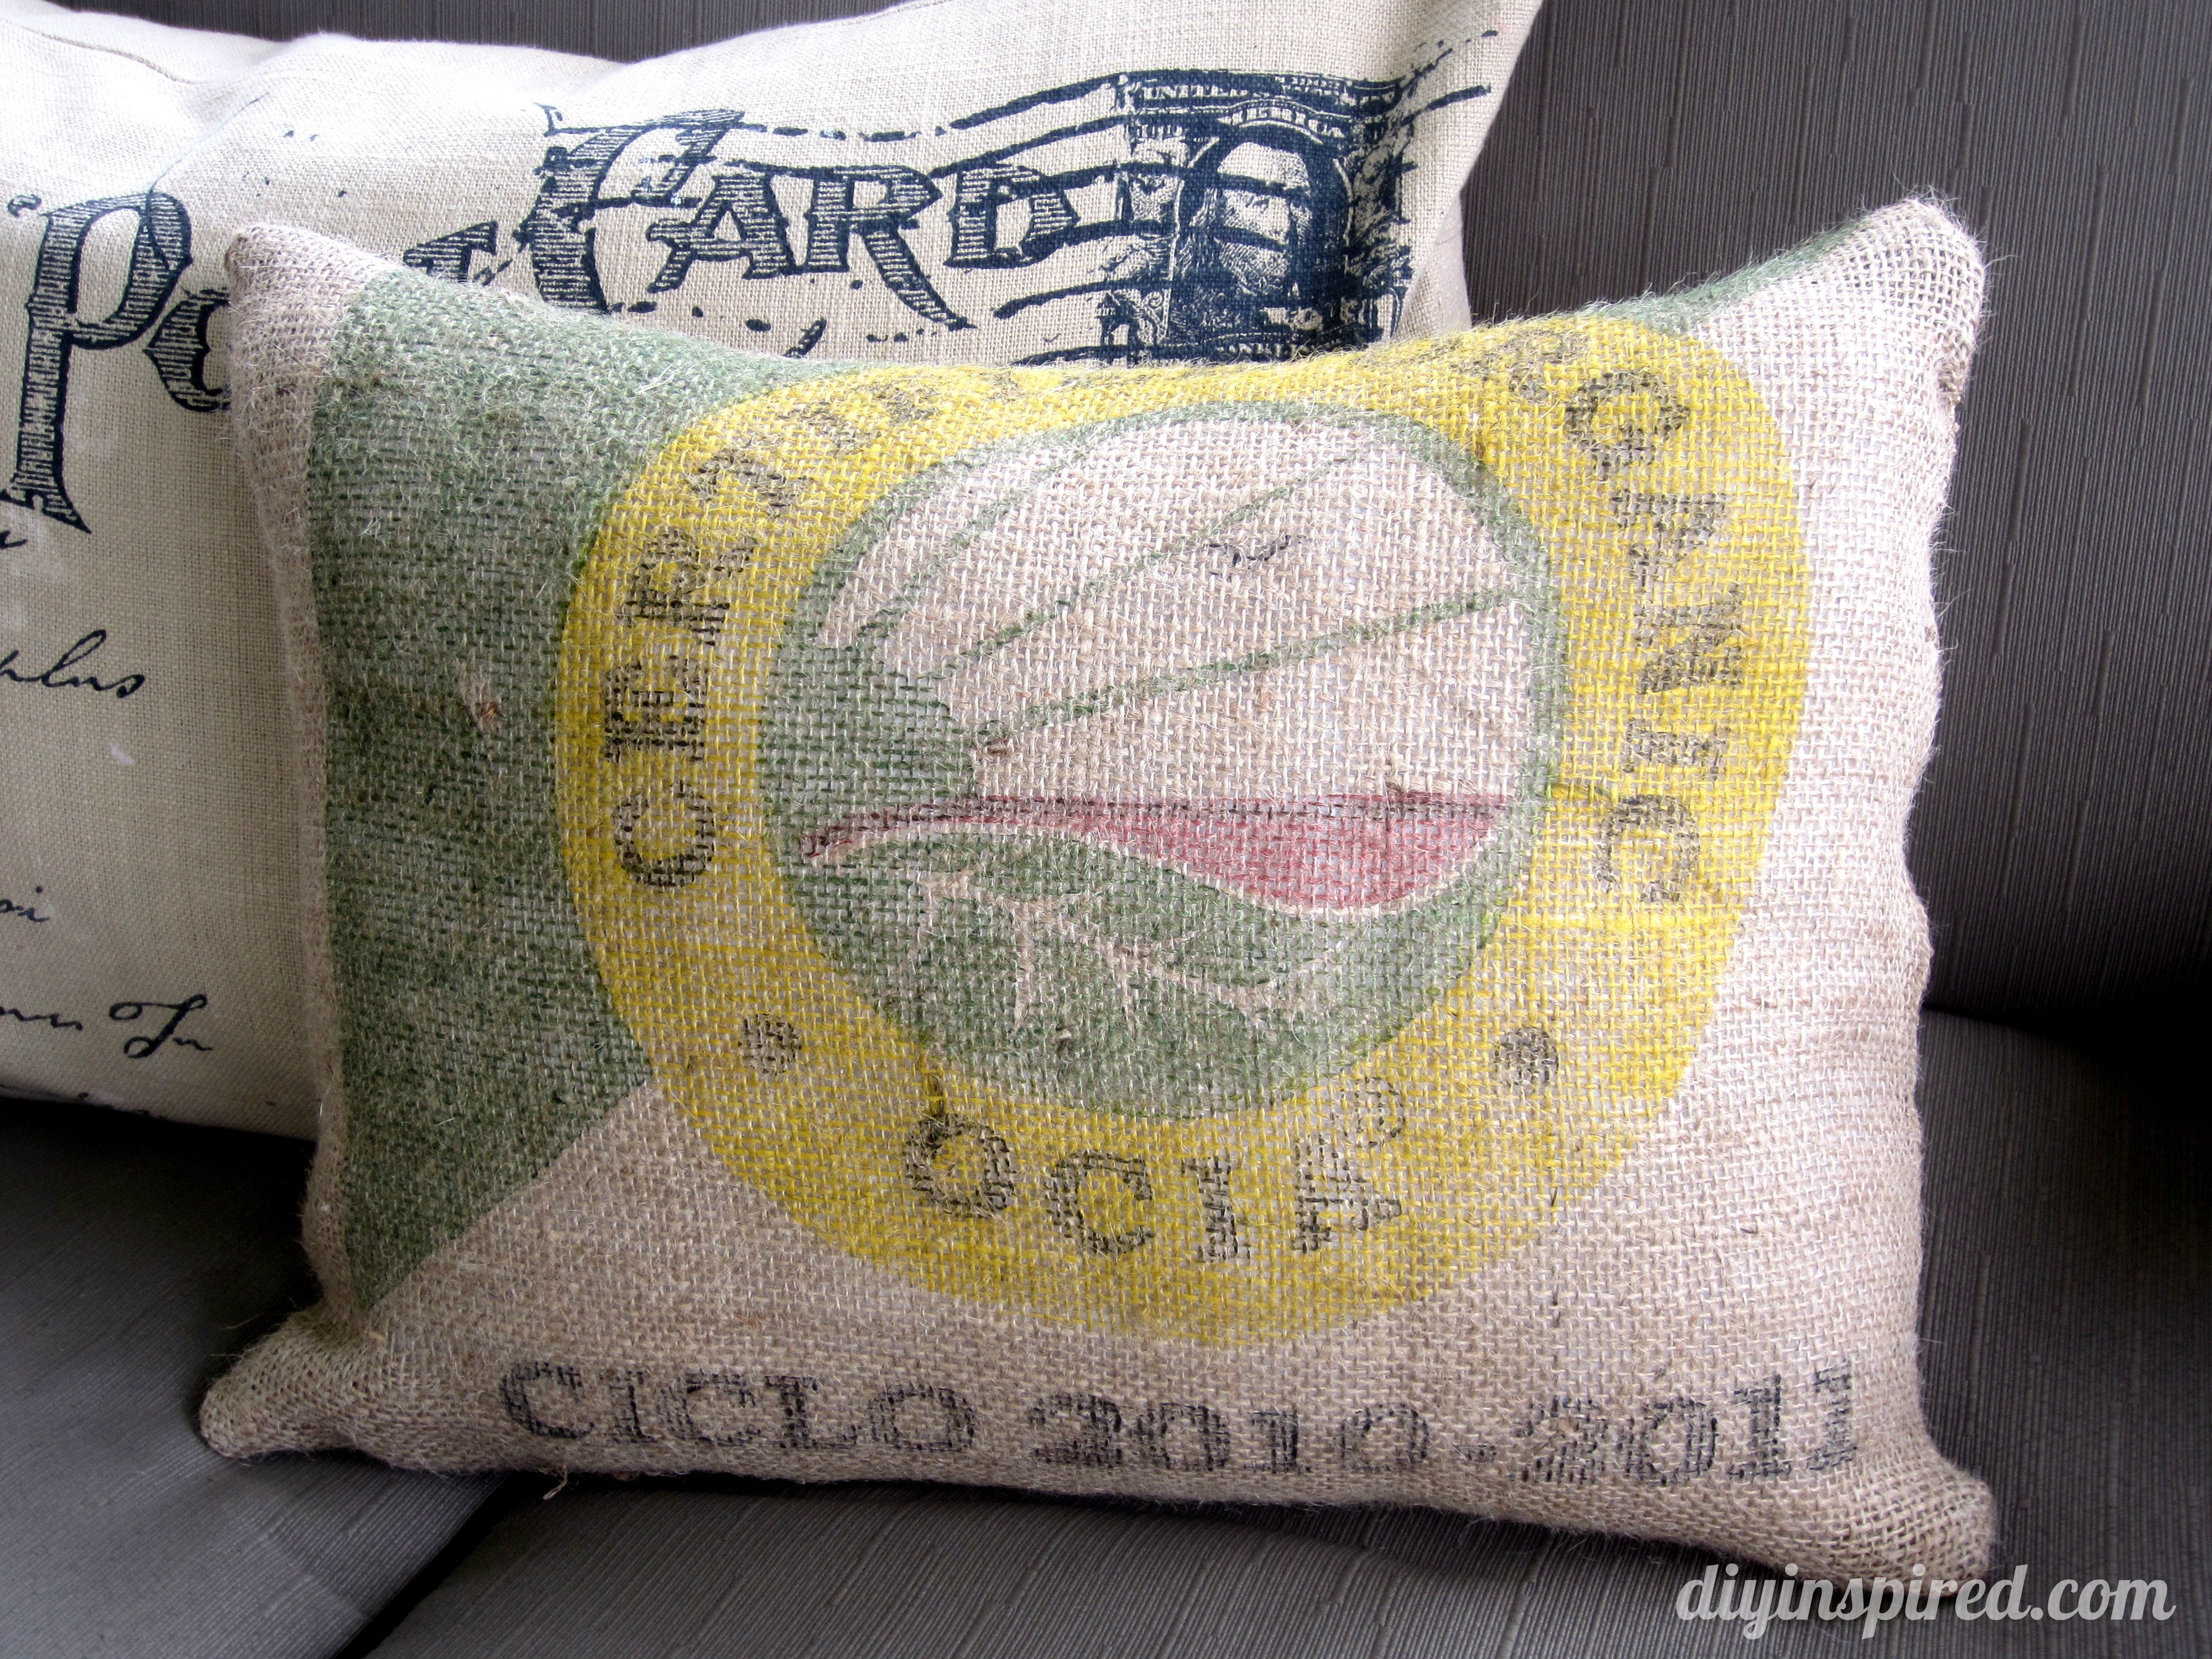 Burlap Sack Pillow  Diy Inspired